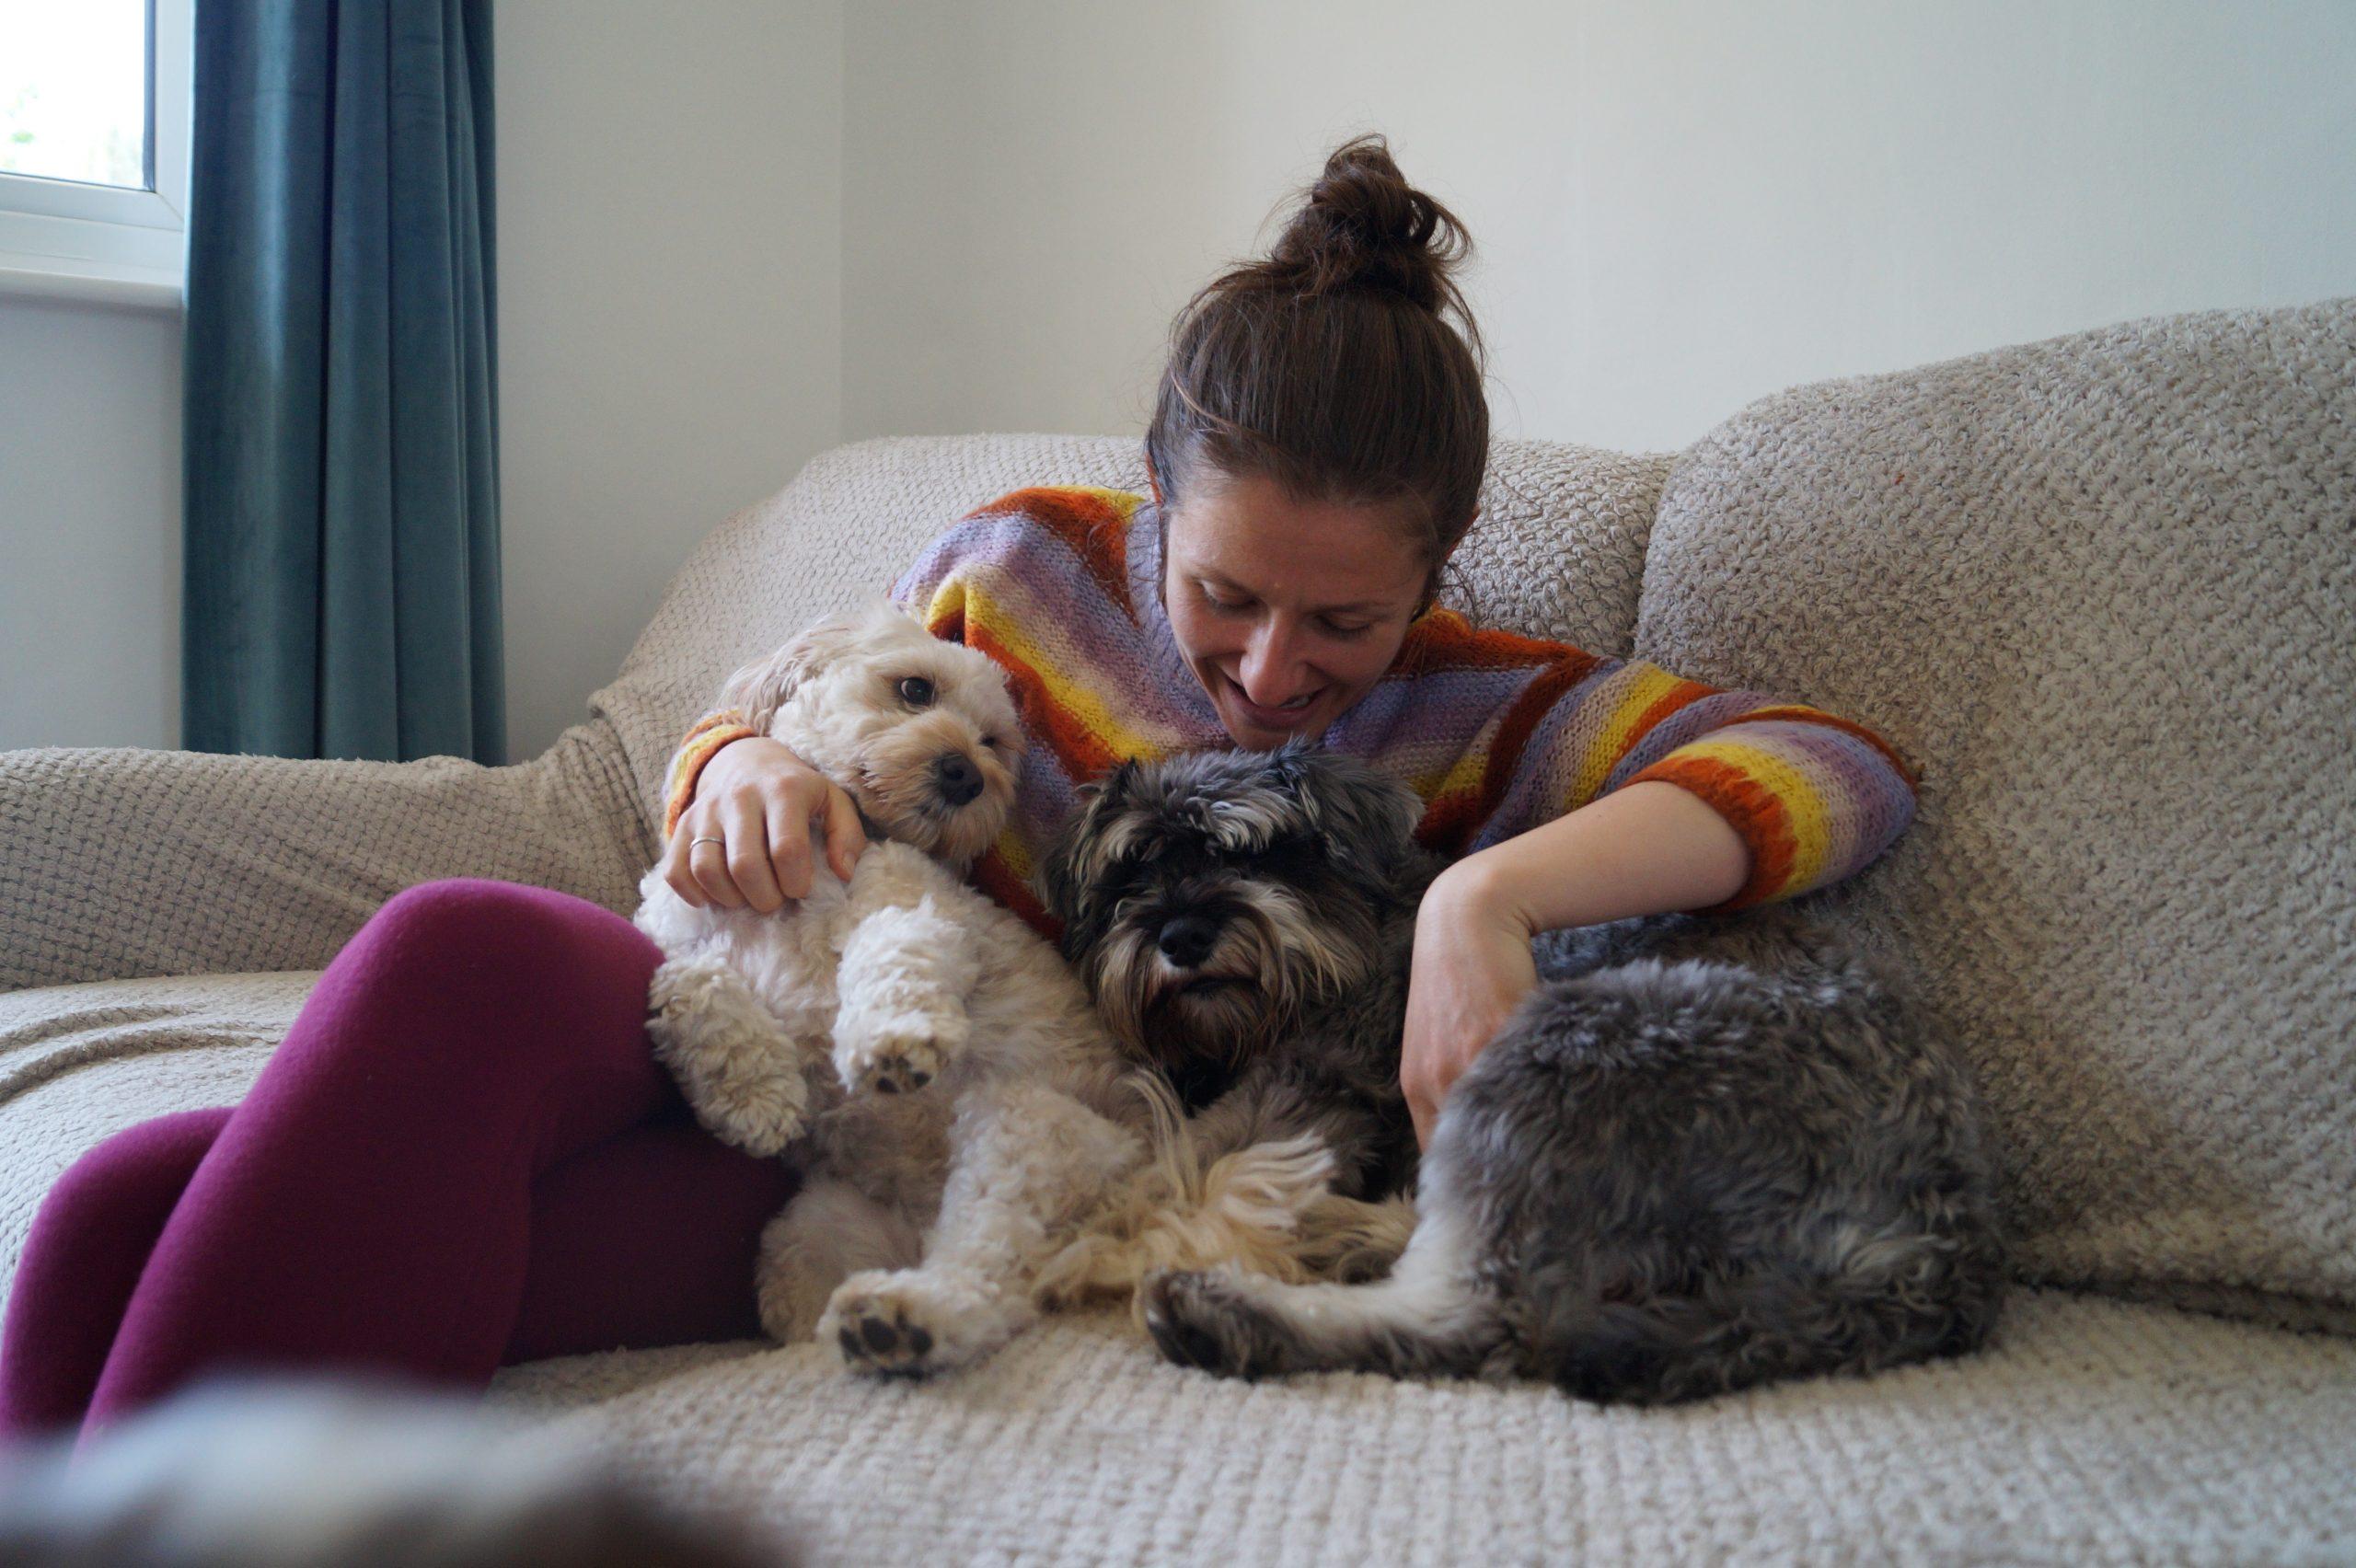 Bright Eyes Dog Care and Training - Cuddles